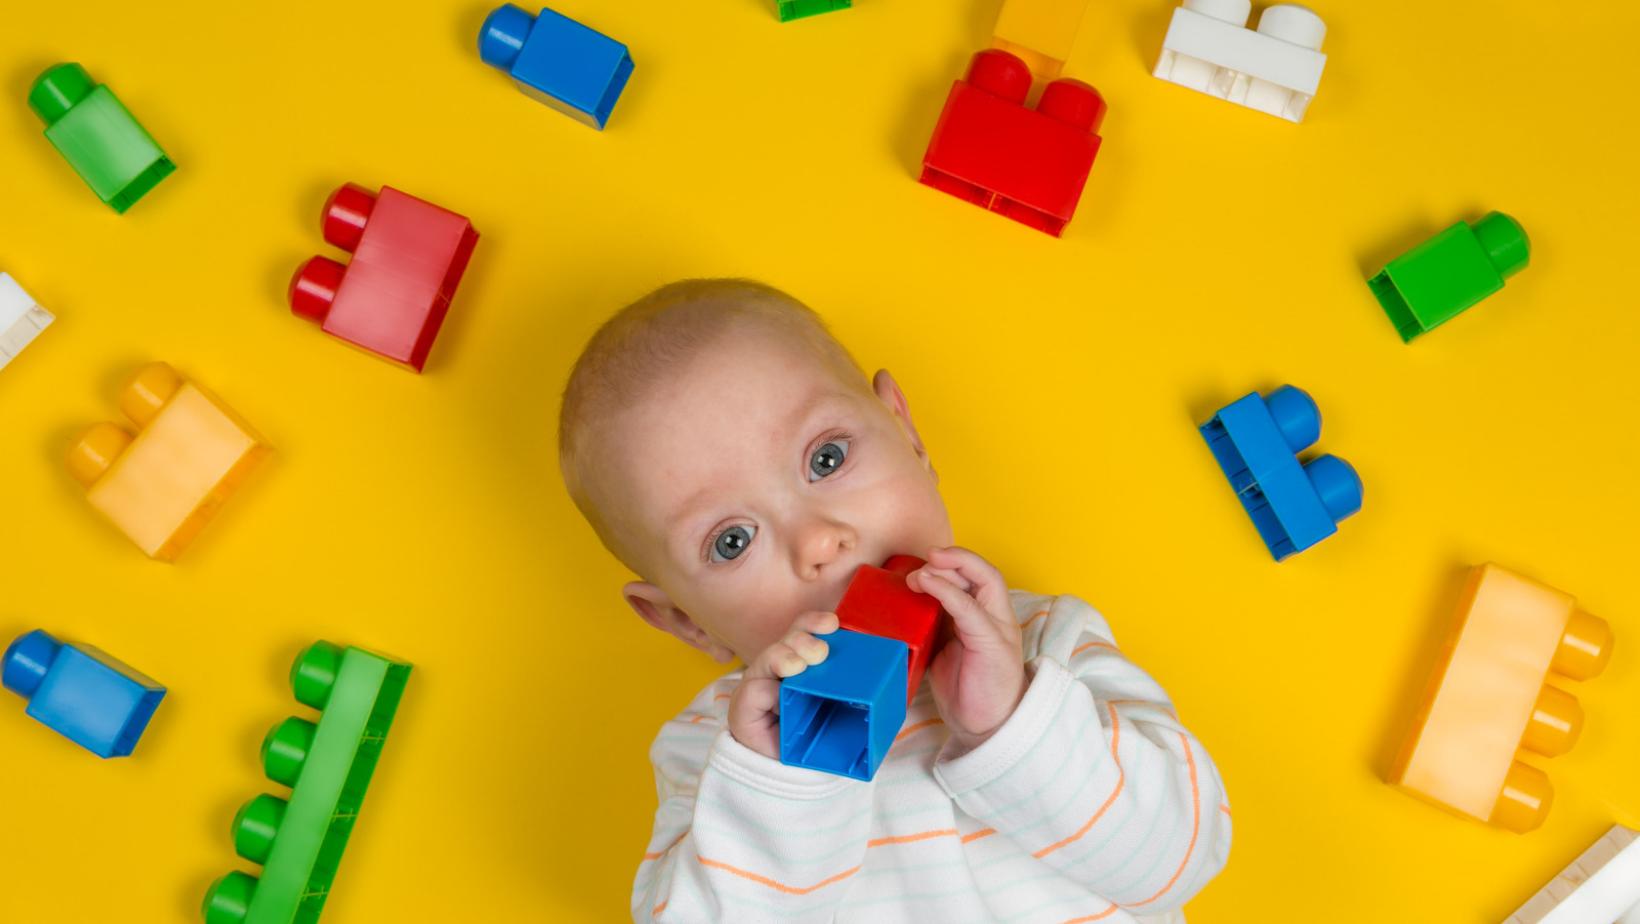 Kada bebe vide boje